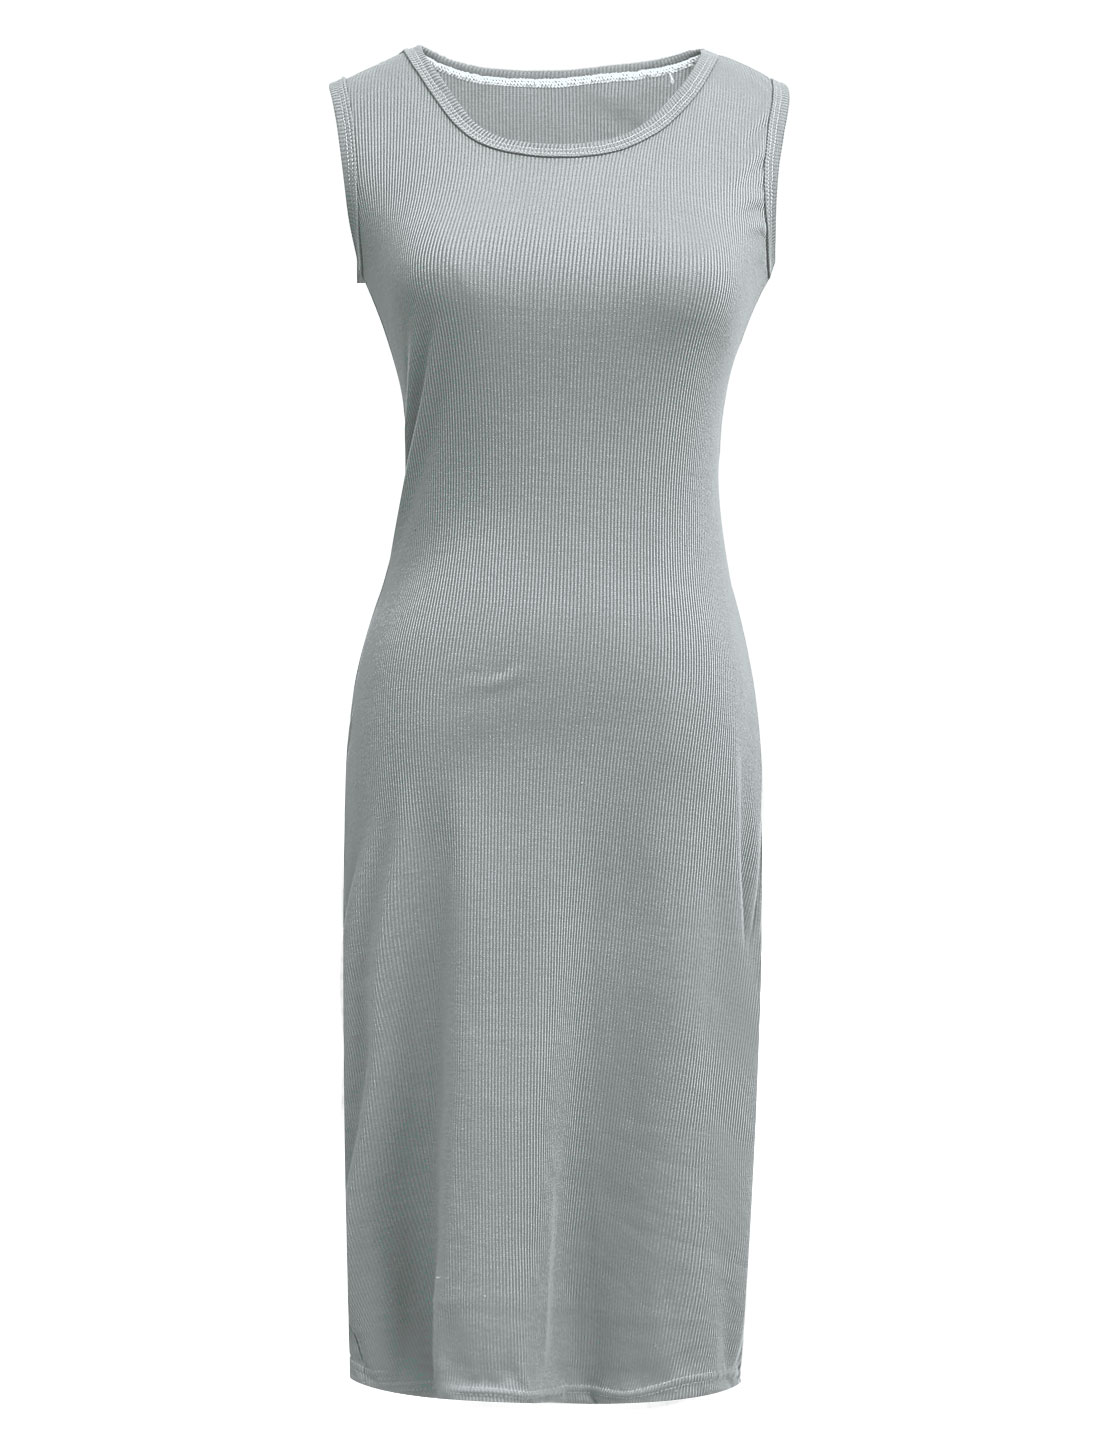 Women Round Neck Sleeveless Ribbed Summer Knitting Dress Gary XS